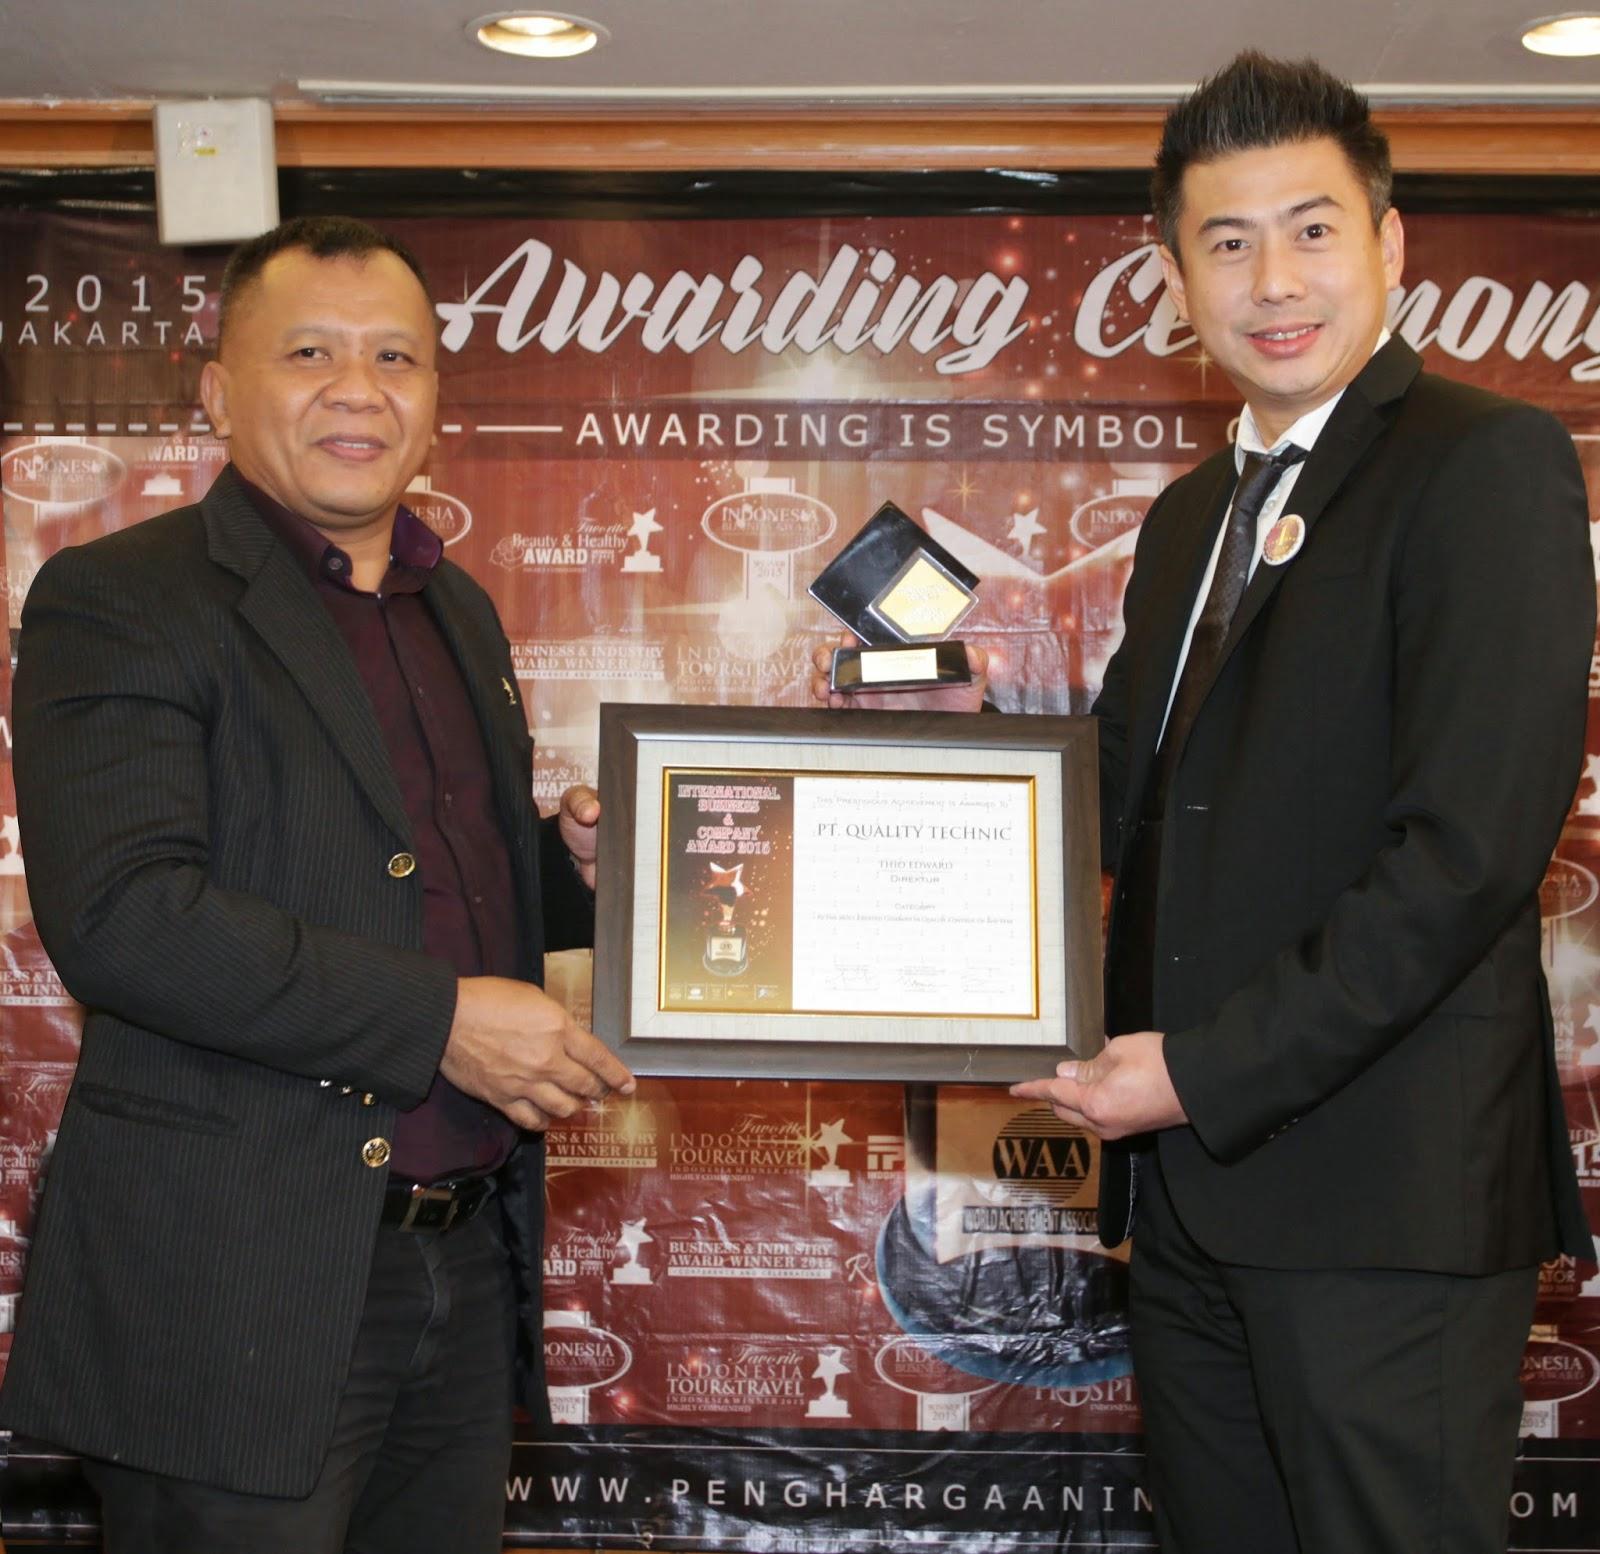 Quality Technic - Quality Power Awards